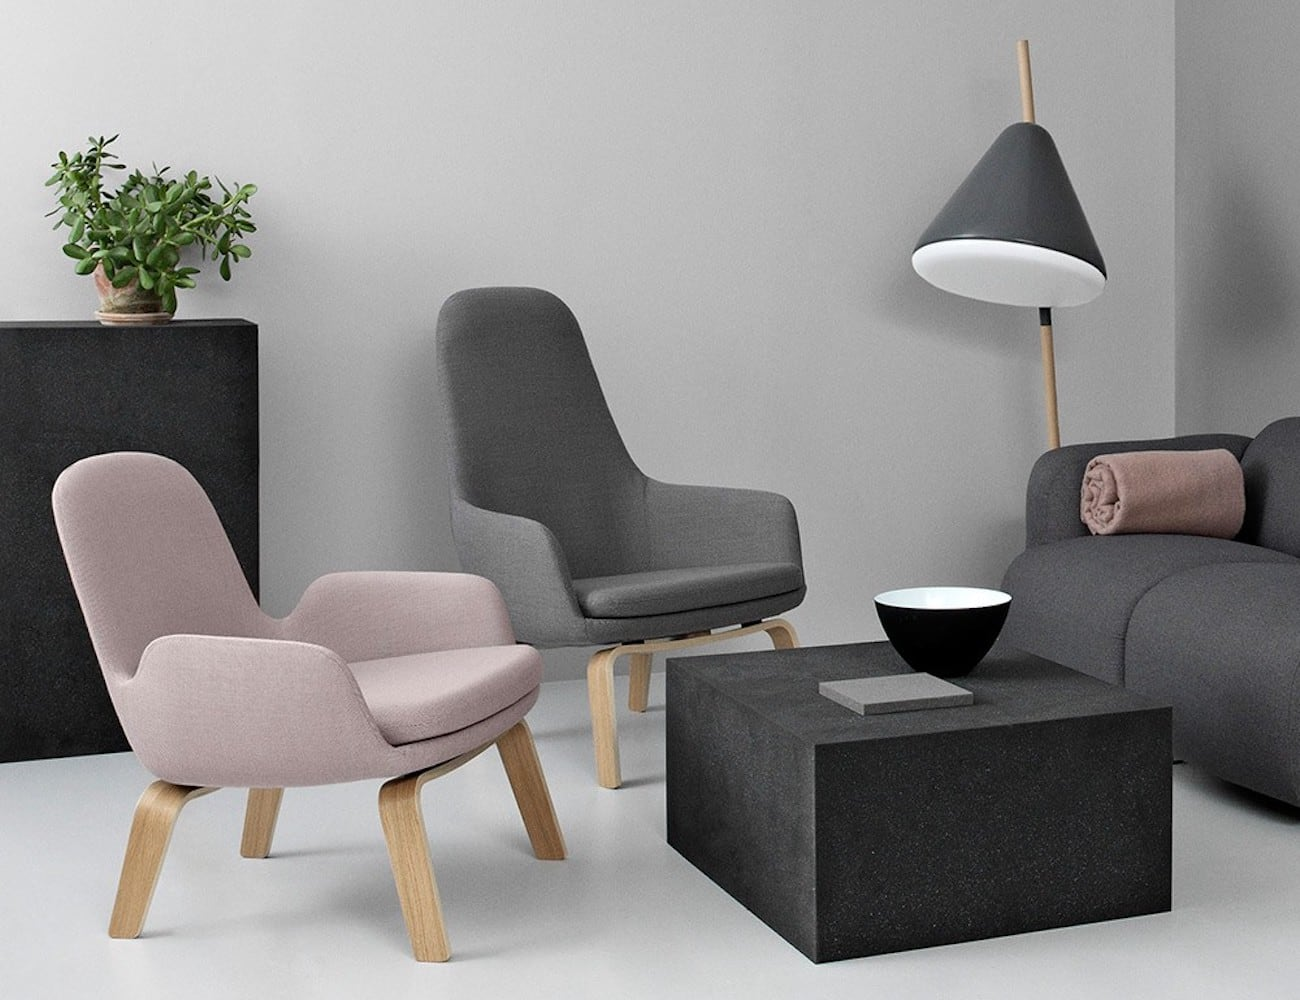 Tremendous Normann Copenhagen Era Lounge Chair Camellatalisay Diy Chair Ideas Camellatalisaycom